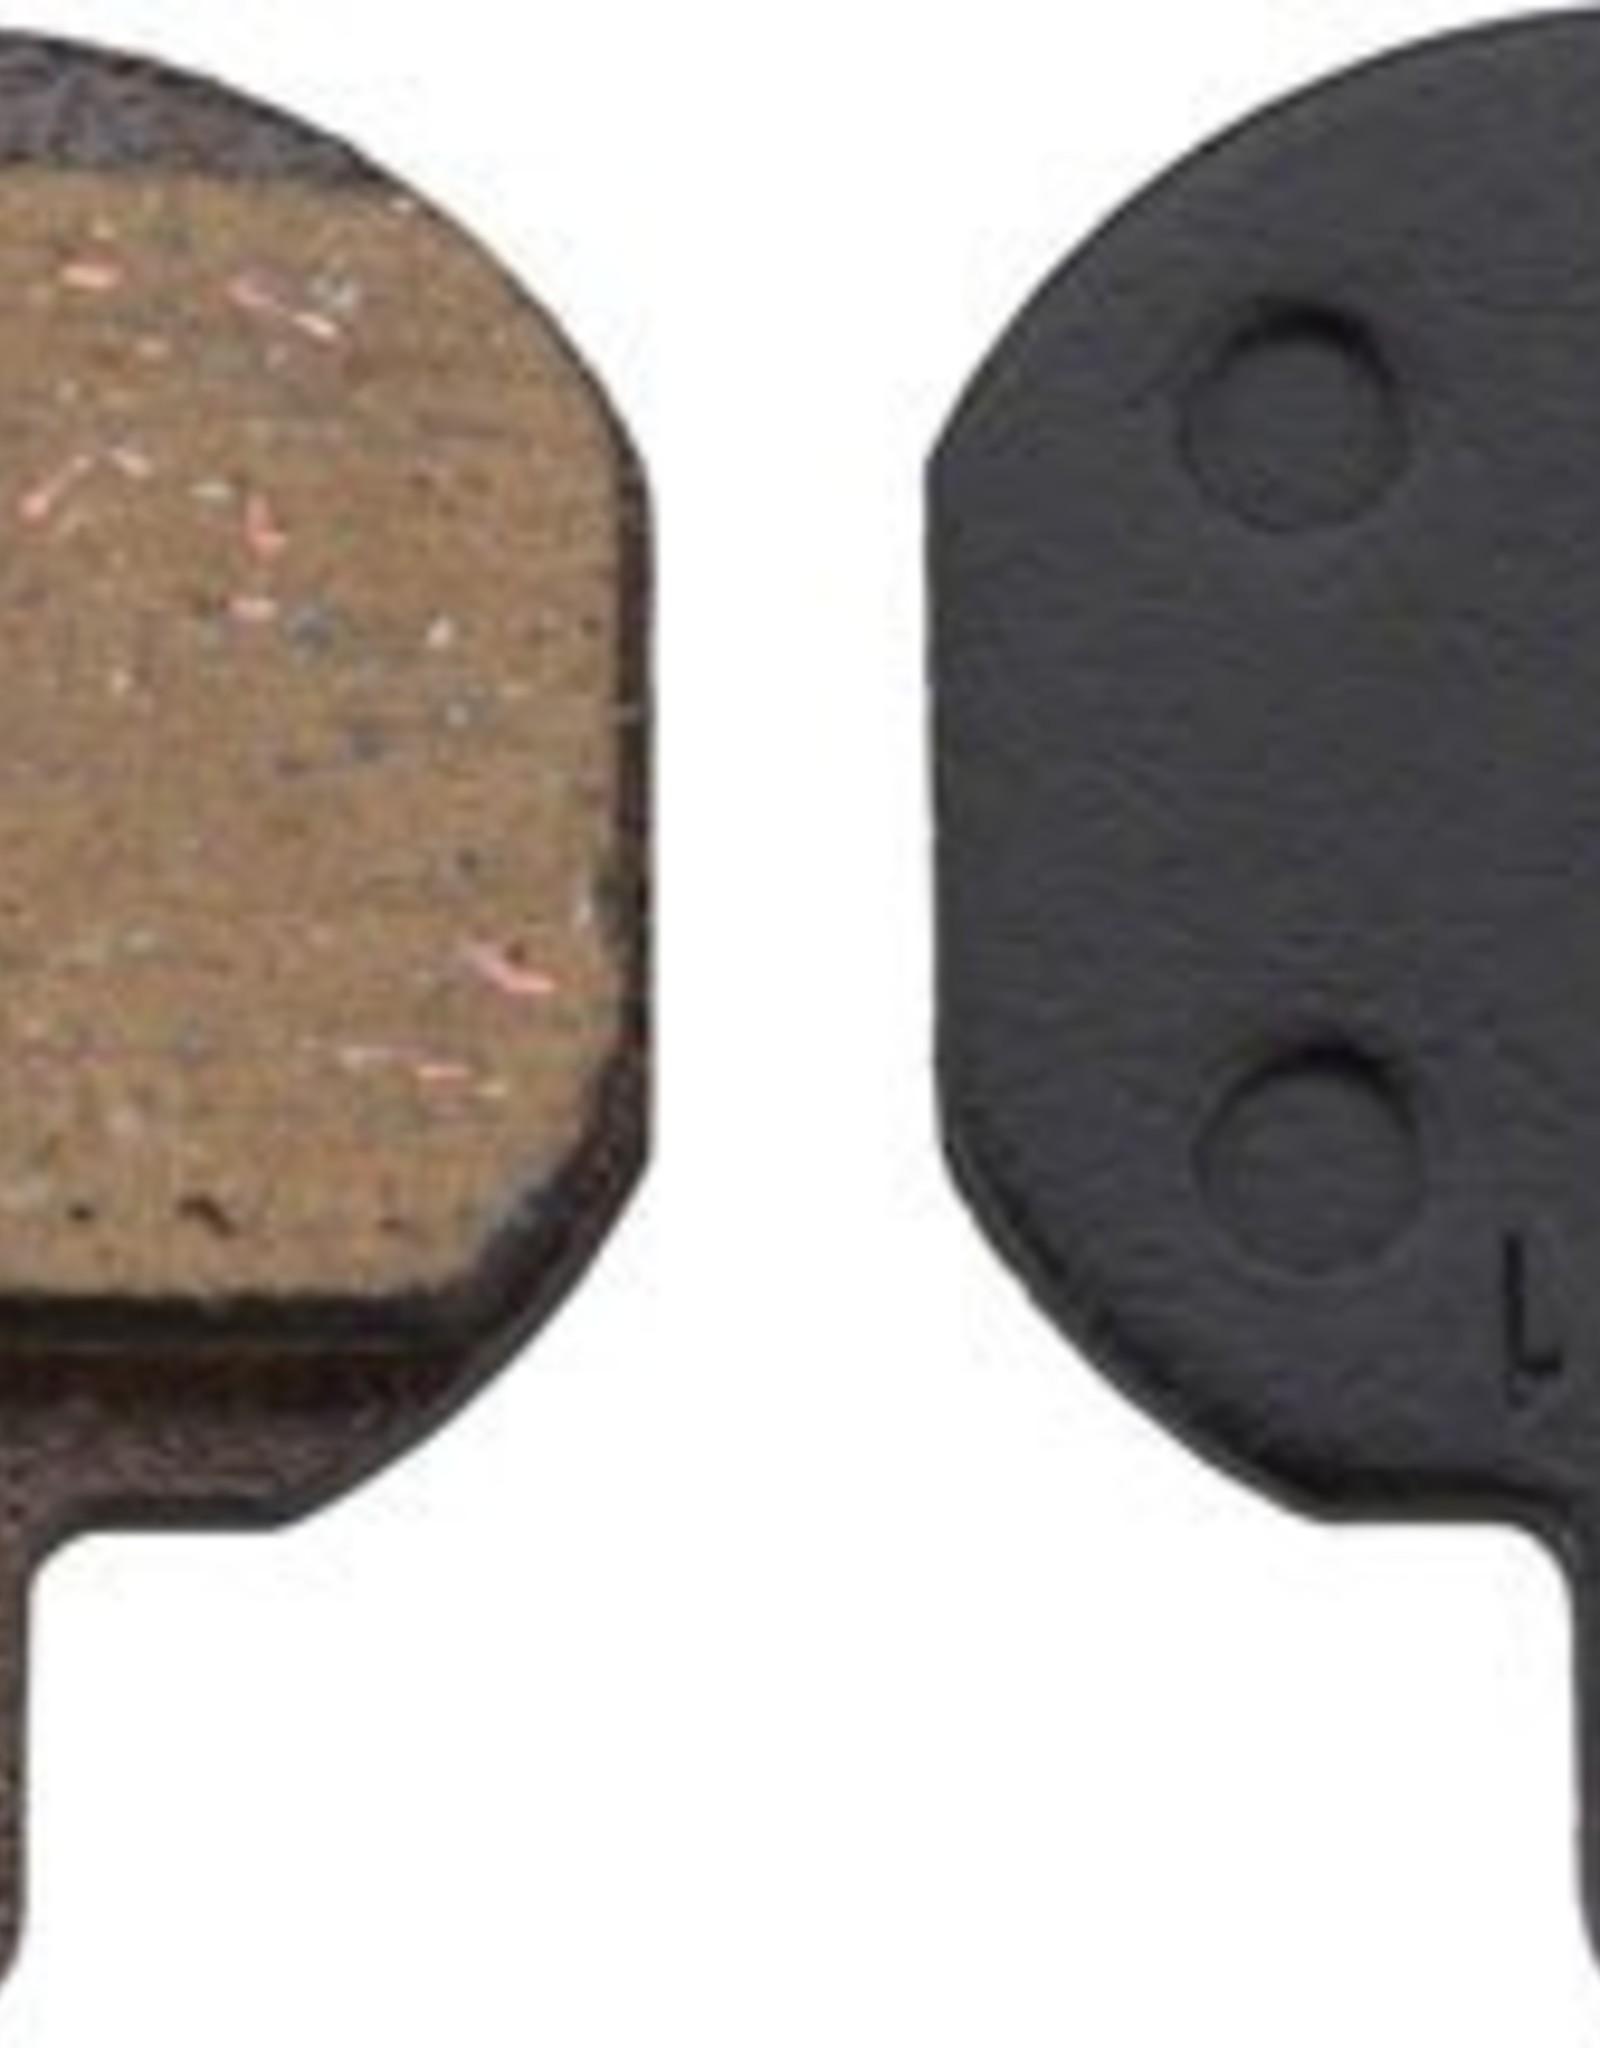 Hayes Disc Brake Pads Semi-Metallic for Sole / MX2 / MX3 / MX4 / MX5 / CX5